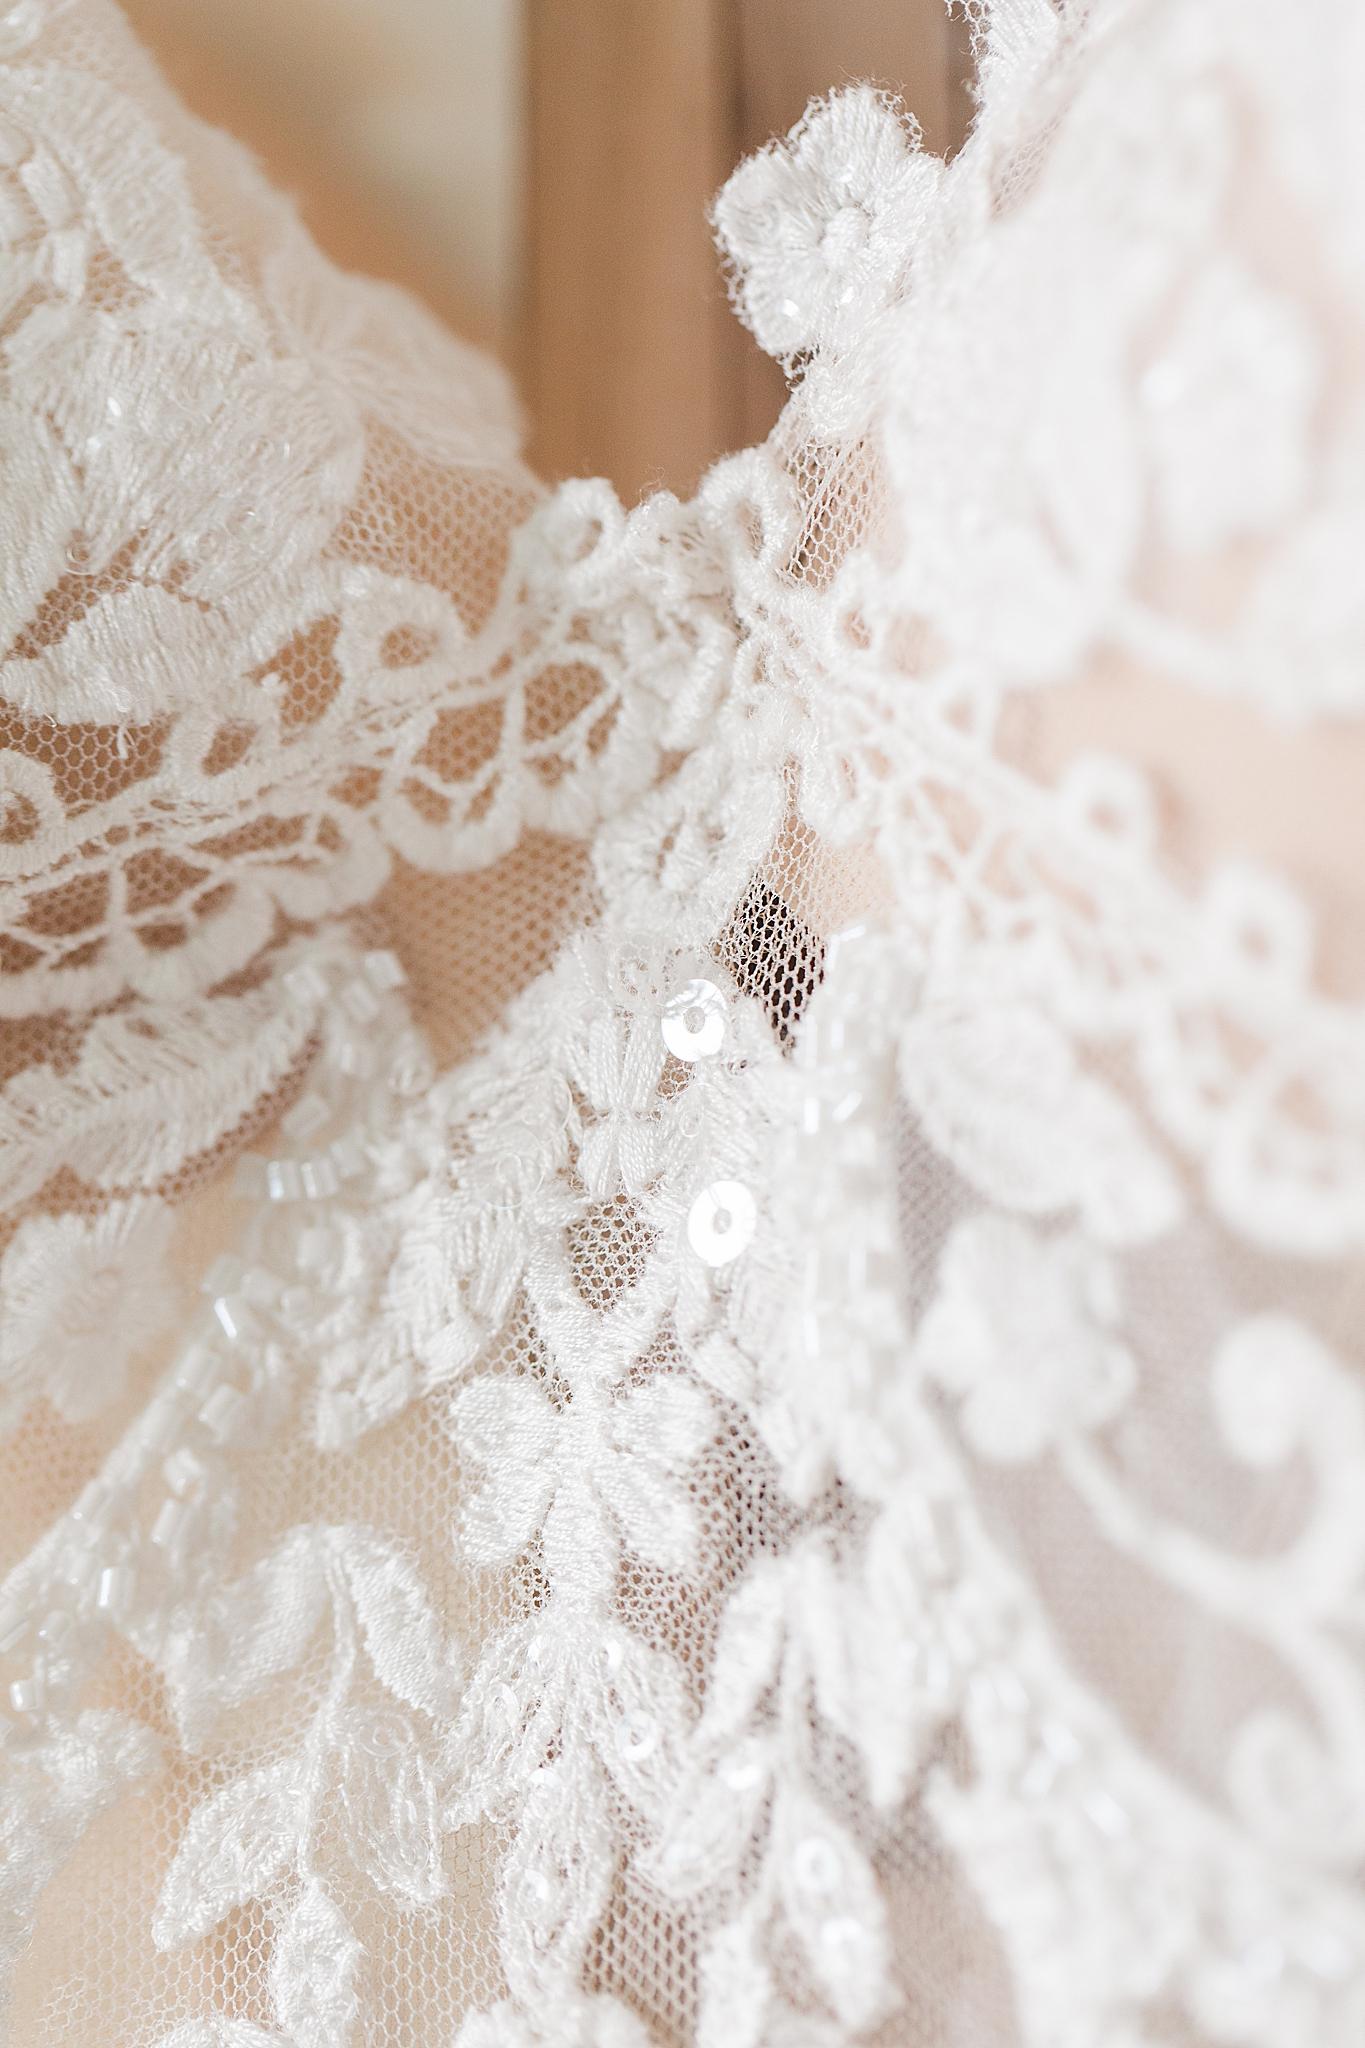 lace details of wedding dress